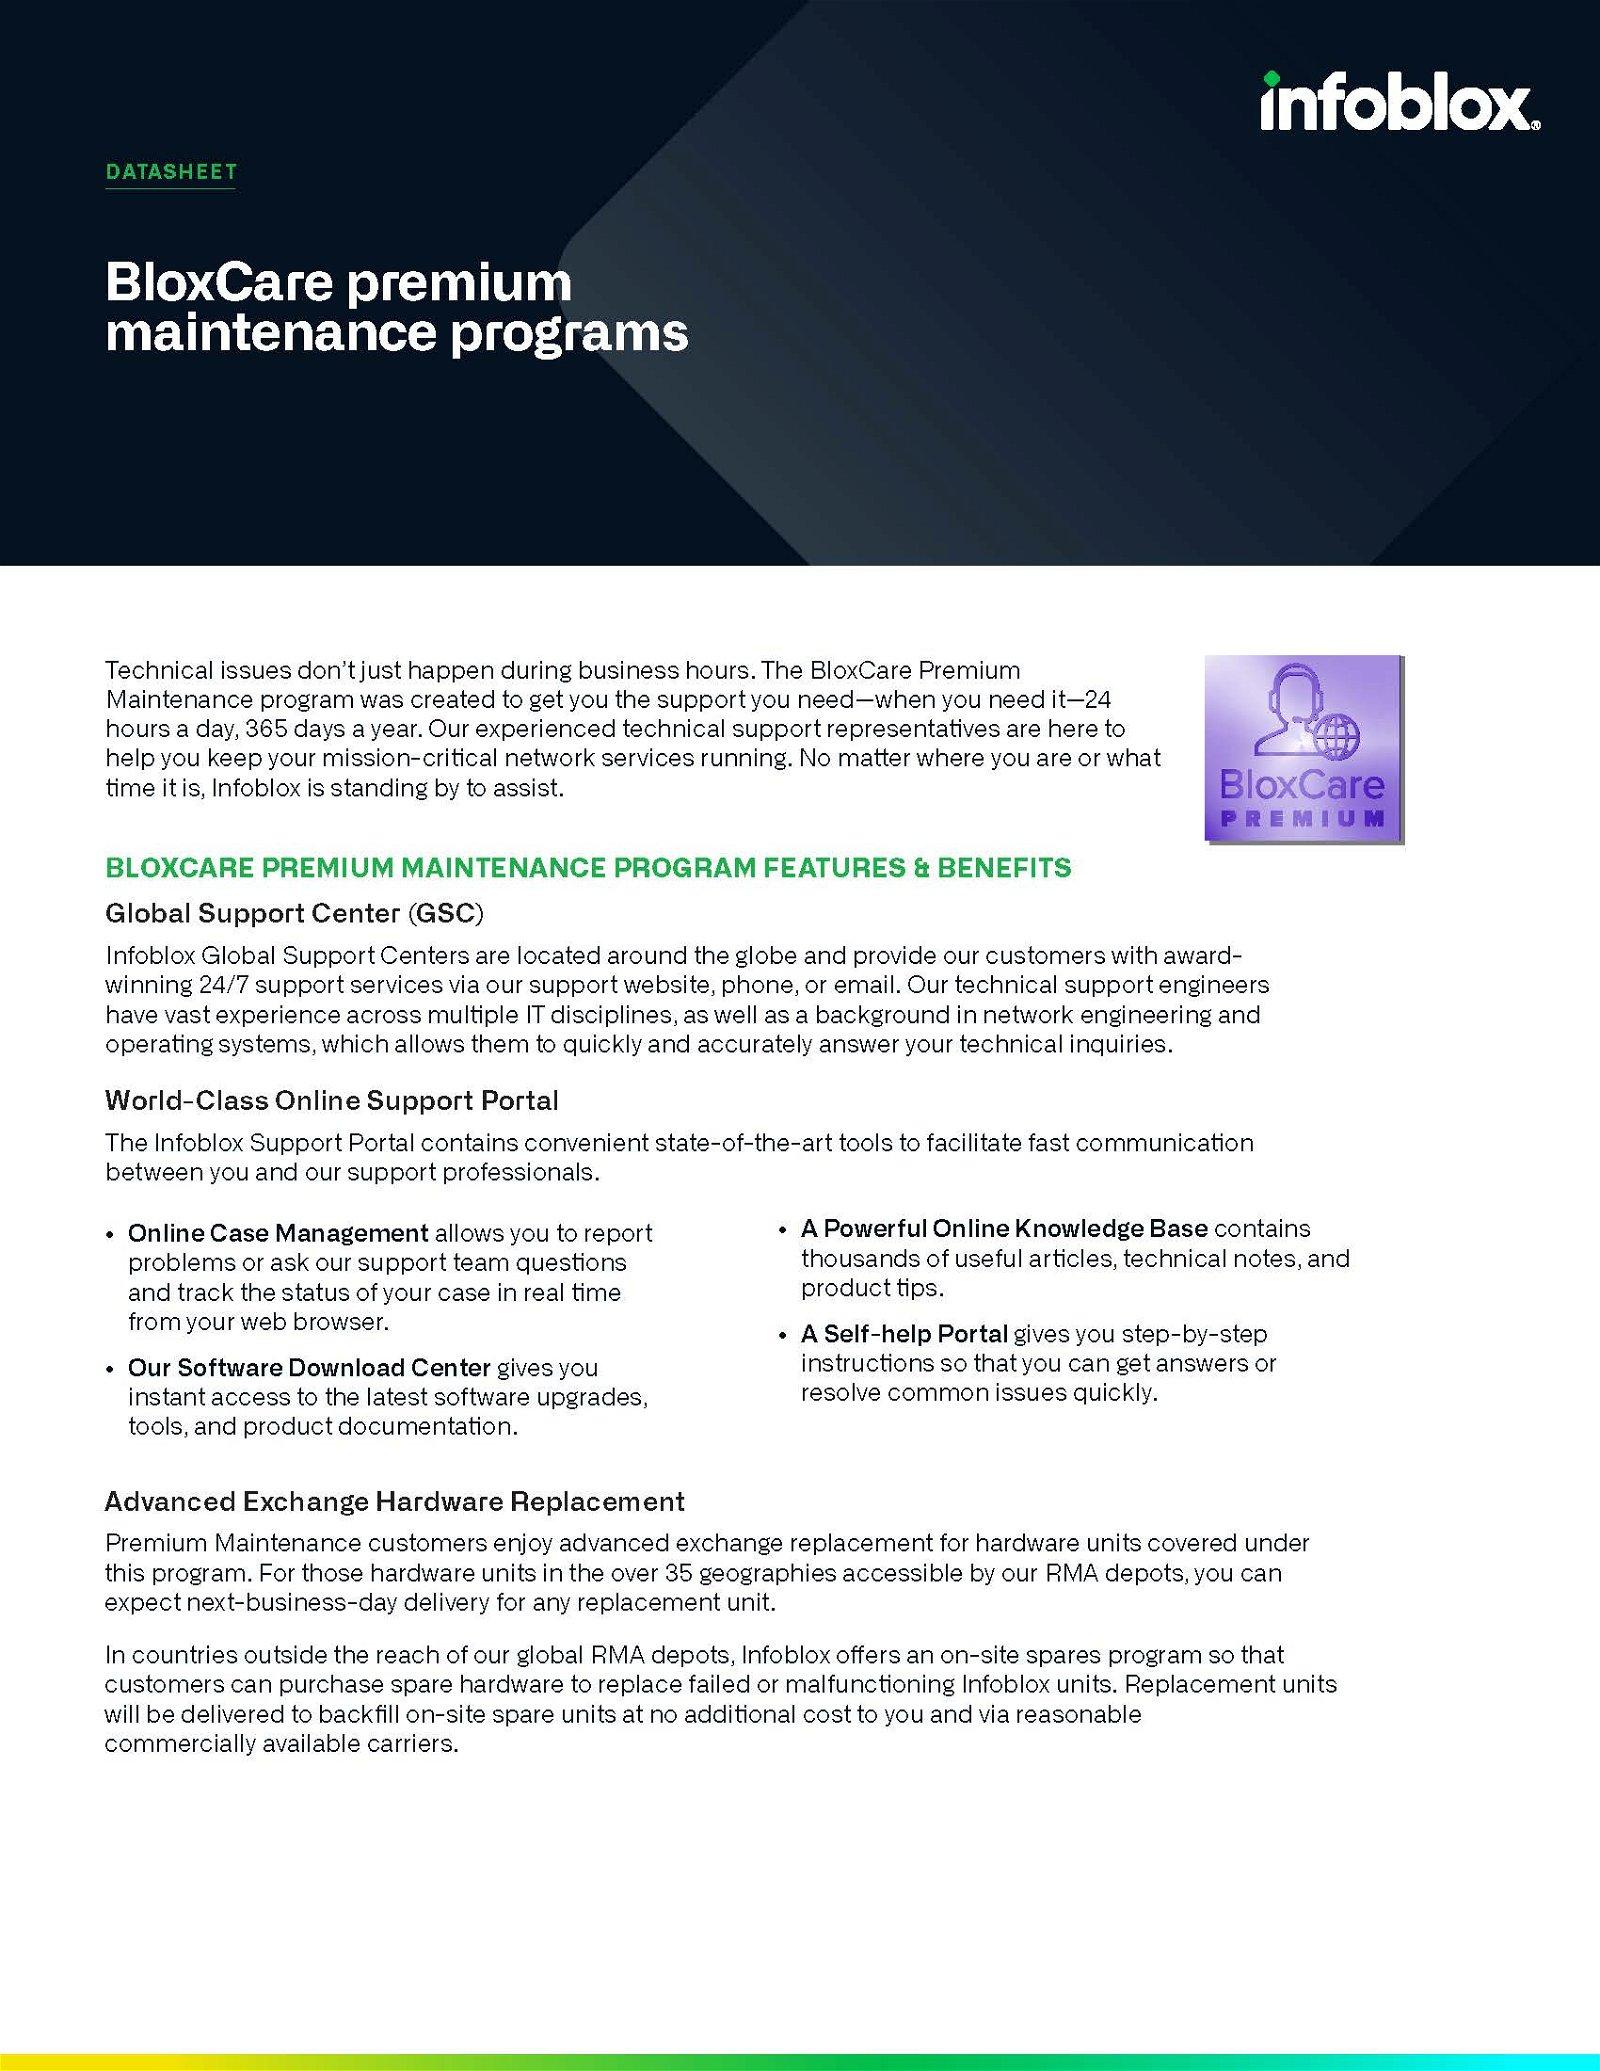 BloxCare Premium Maintenance Program